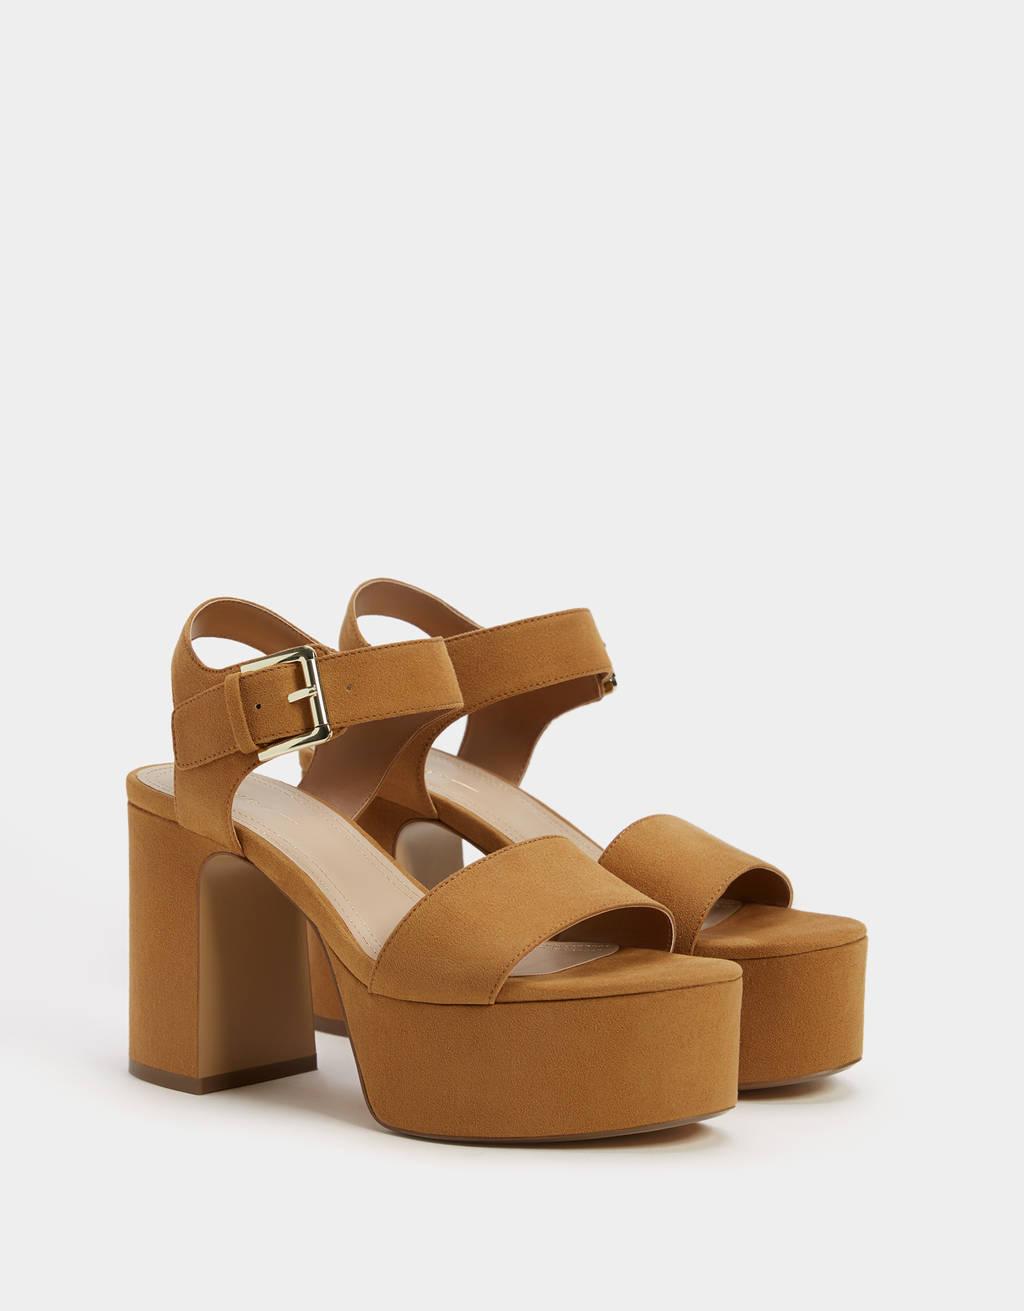 High-heel platform sandals